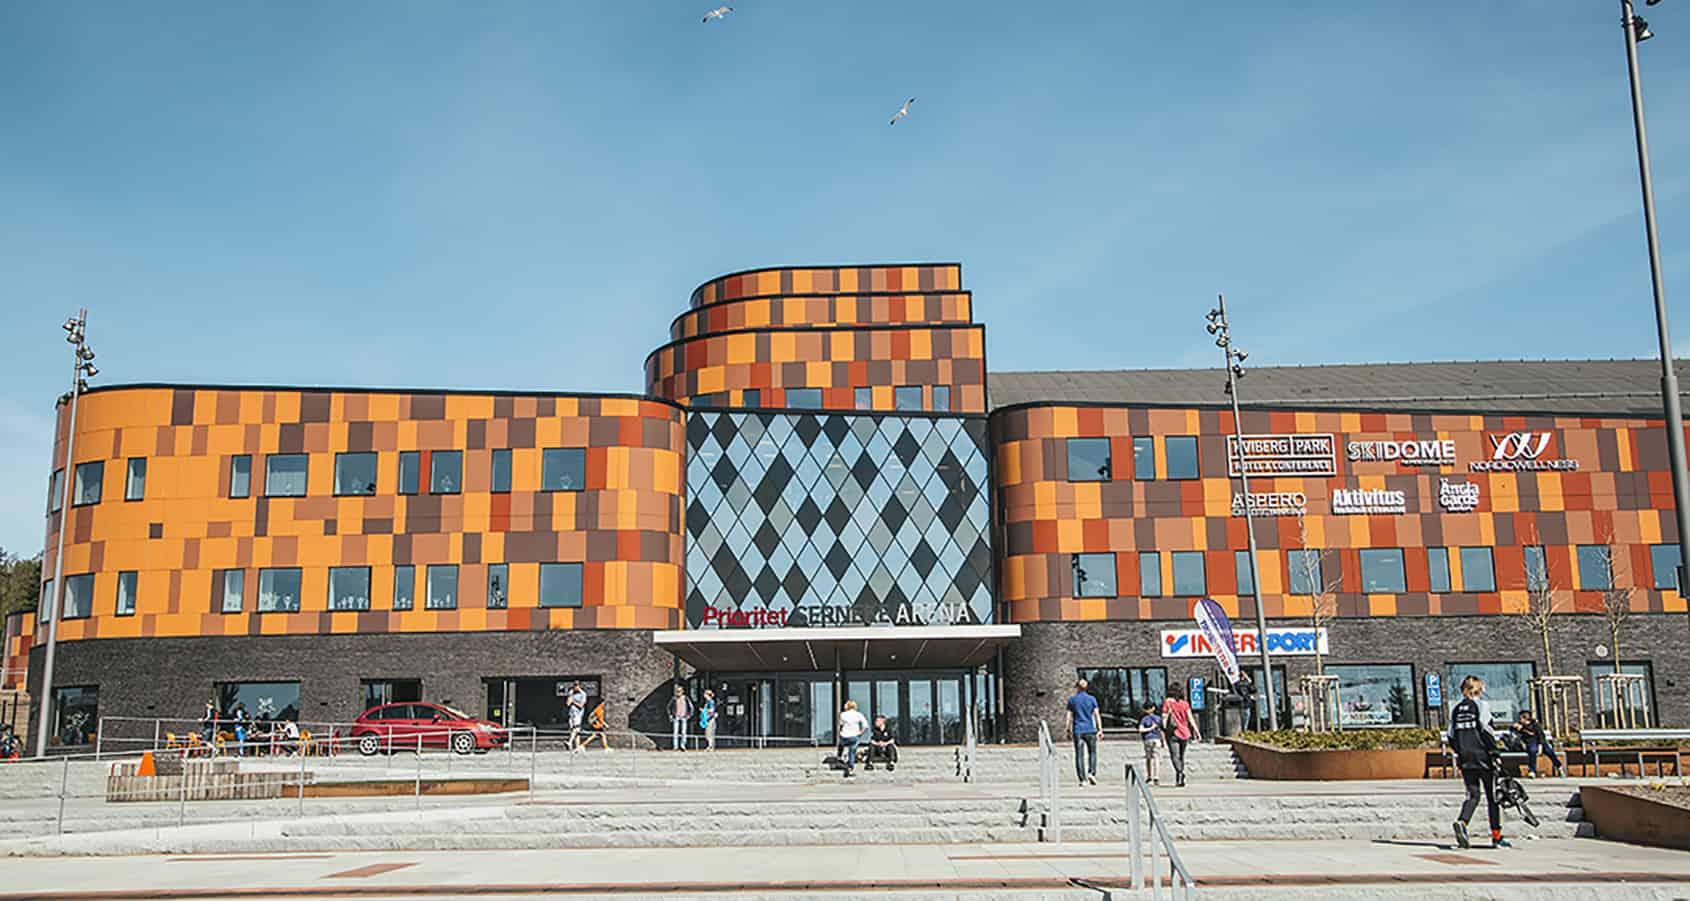 Inspirational image for Göteborg, Prioritet Serneke Arena